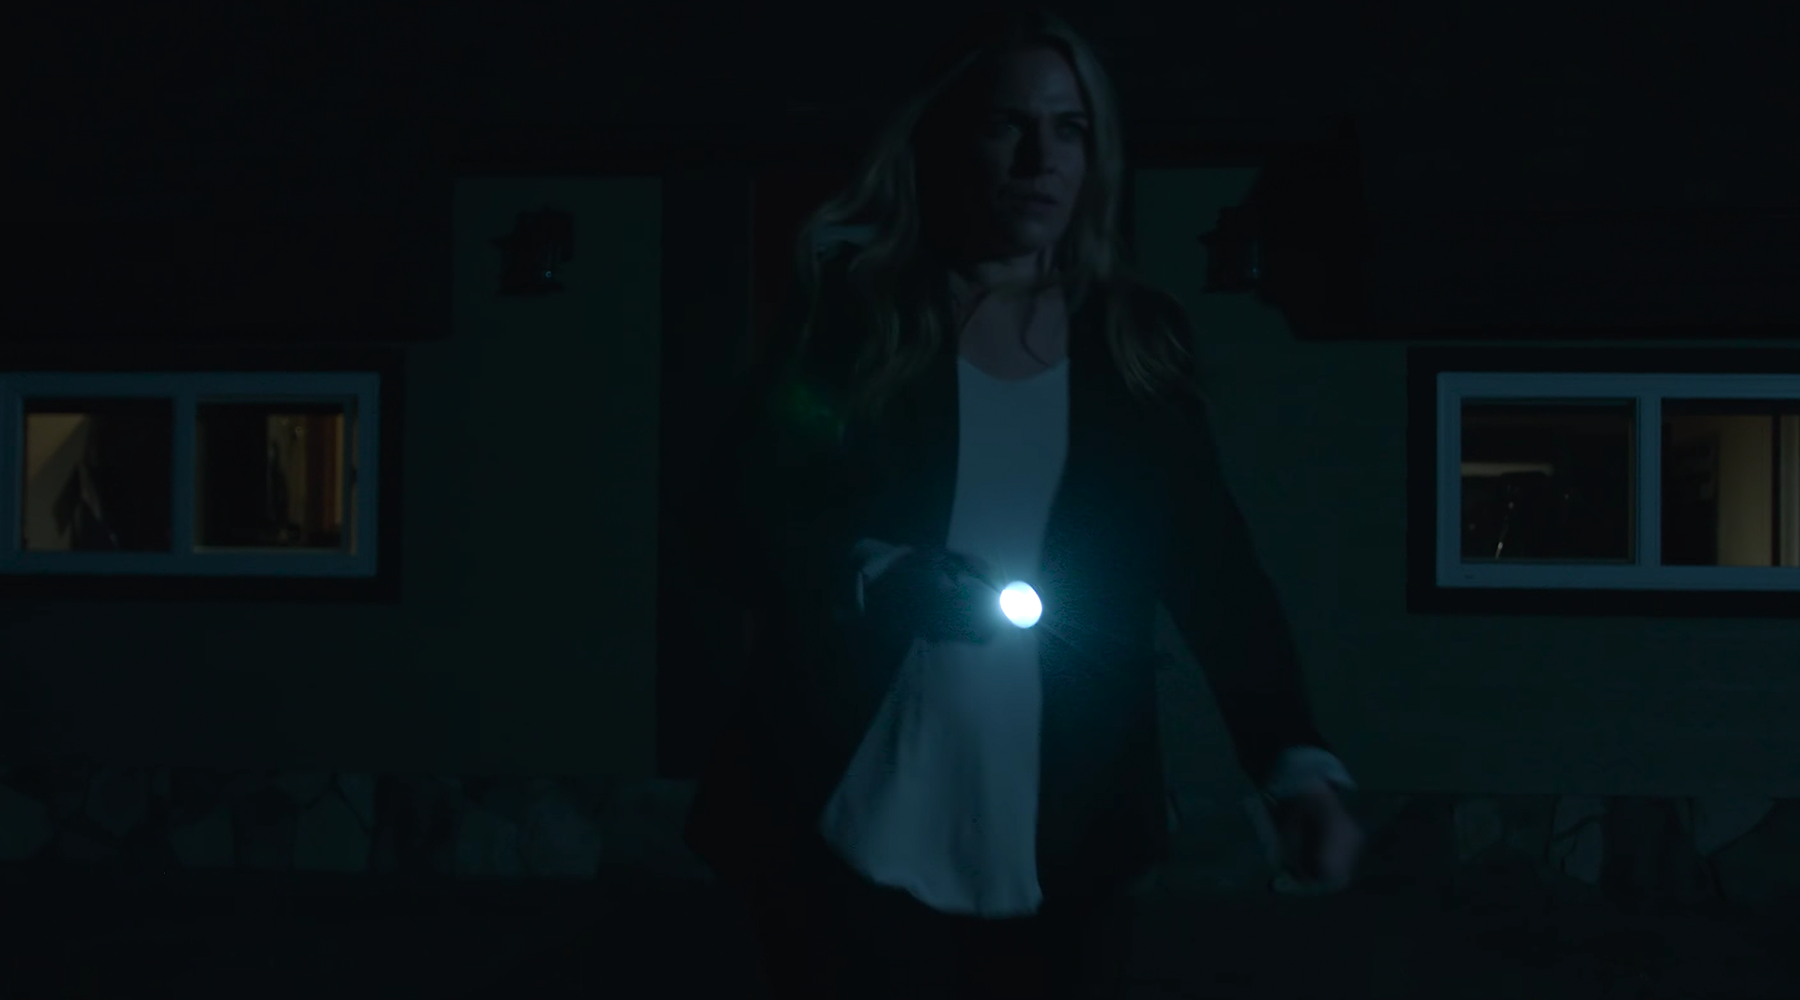 Exterior Lighting for a Horror Film - Moonlight